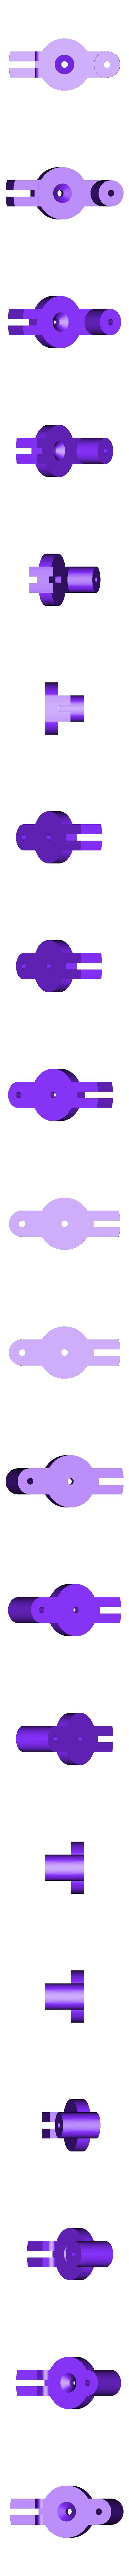 movement_hinge.stl Download free STL file 8 legged spider robot • 3D print design, brianbrocken